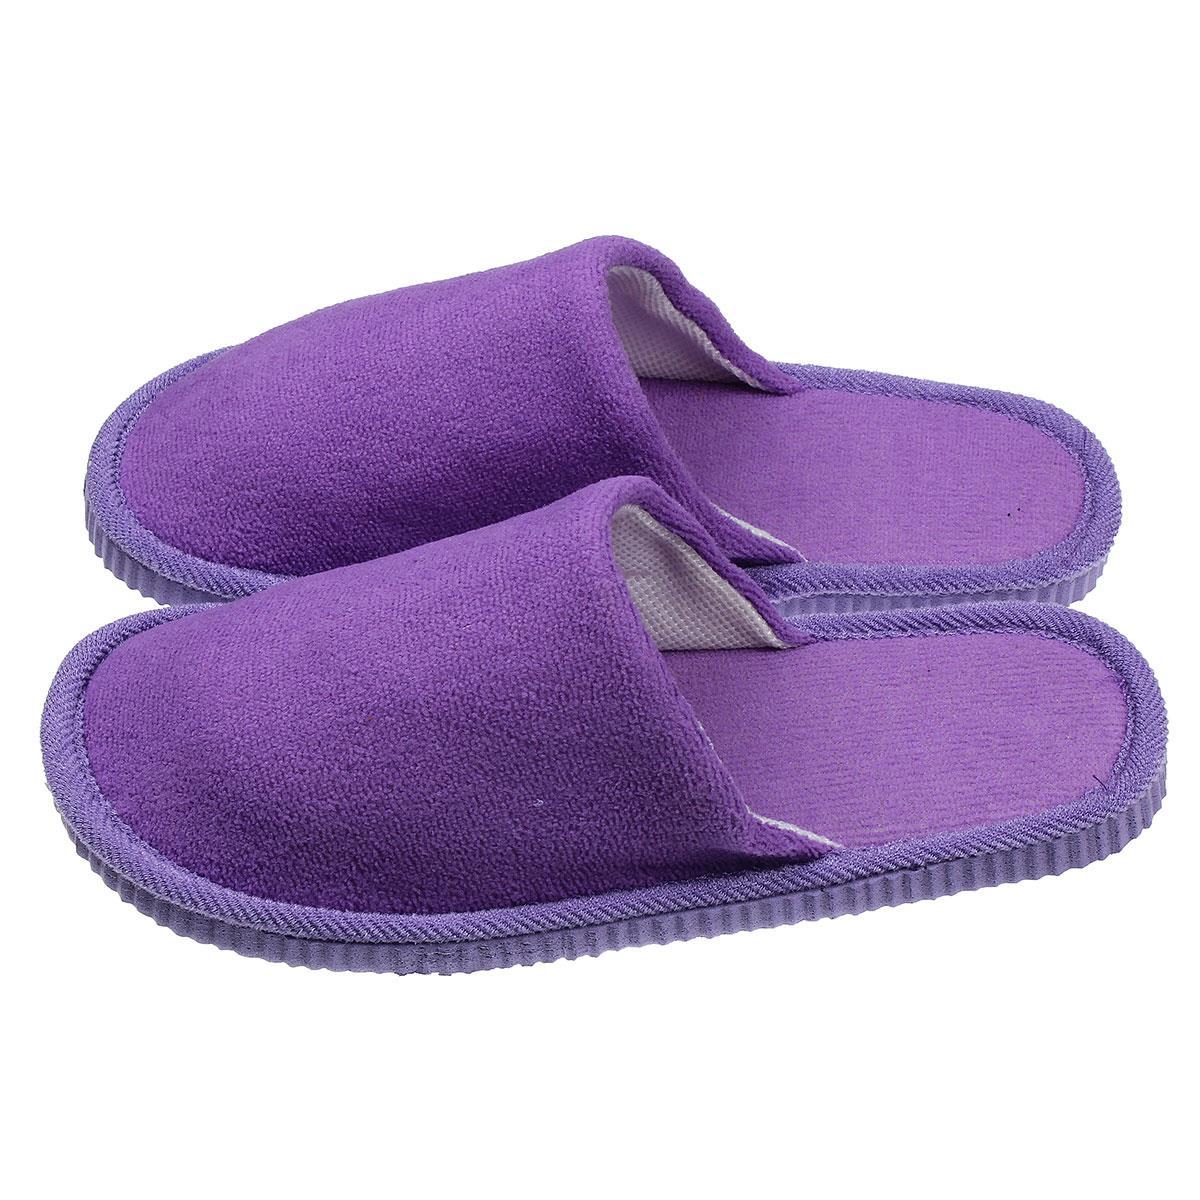 Men Bedroom Slippers Online Get Cheap Mens House Slippers Aliexpresscom Alibaba Group